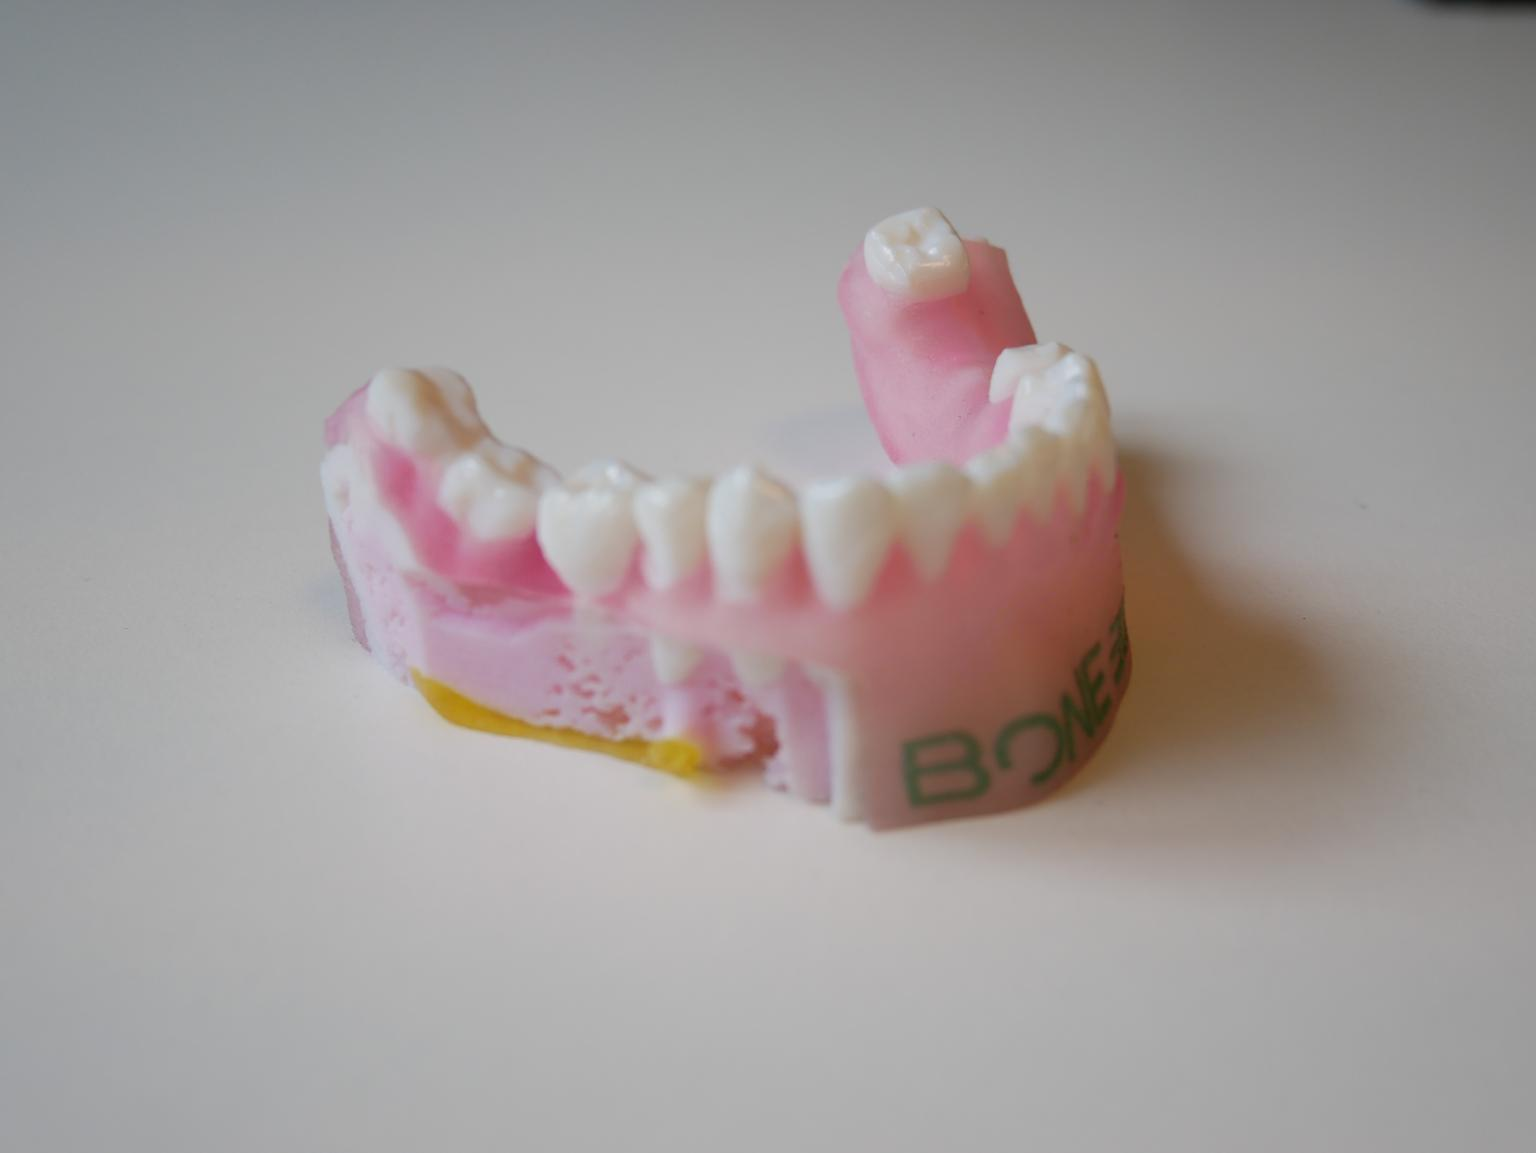 A 3D printed orthodontic model produced on the Stratasys J750. Photo via Bone 3D.